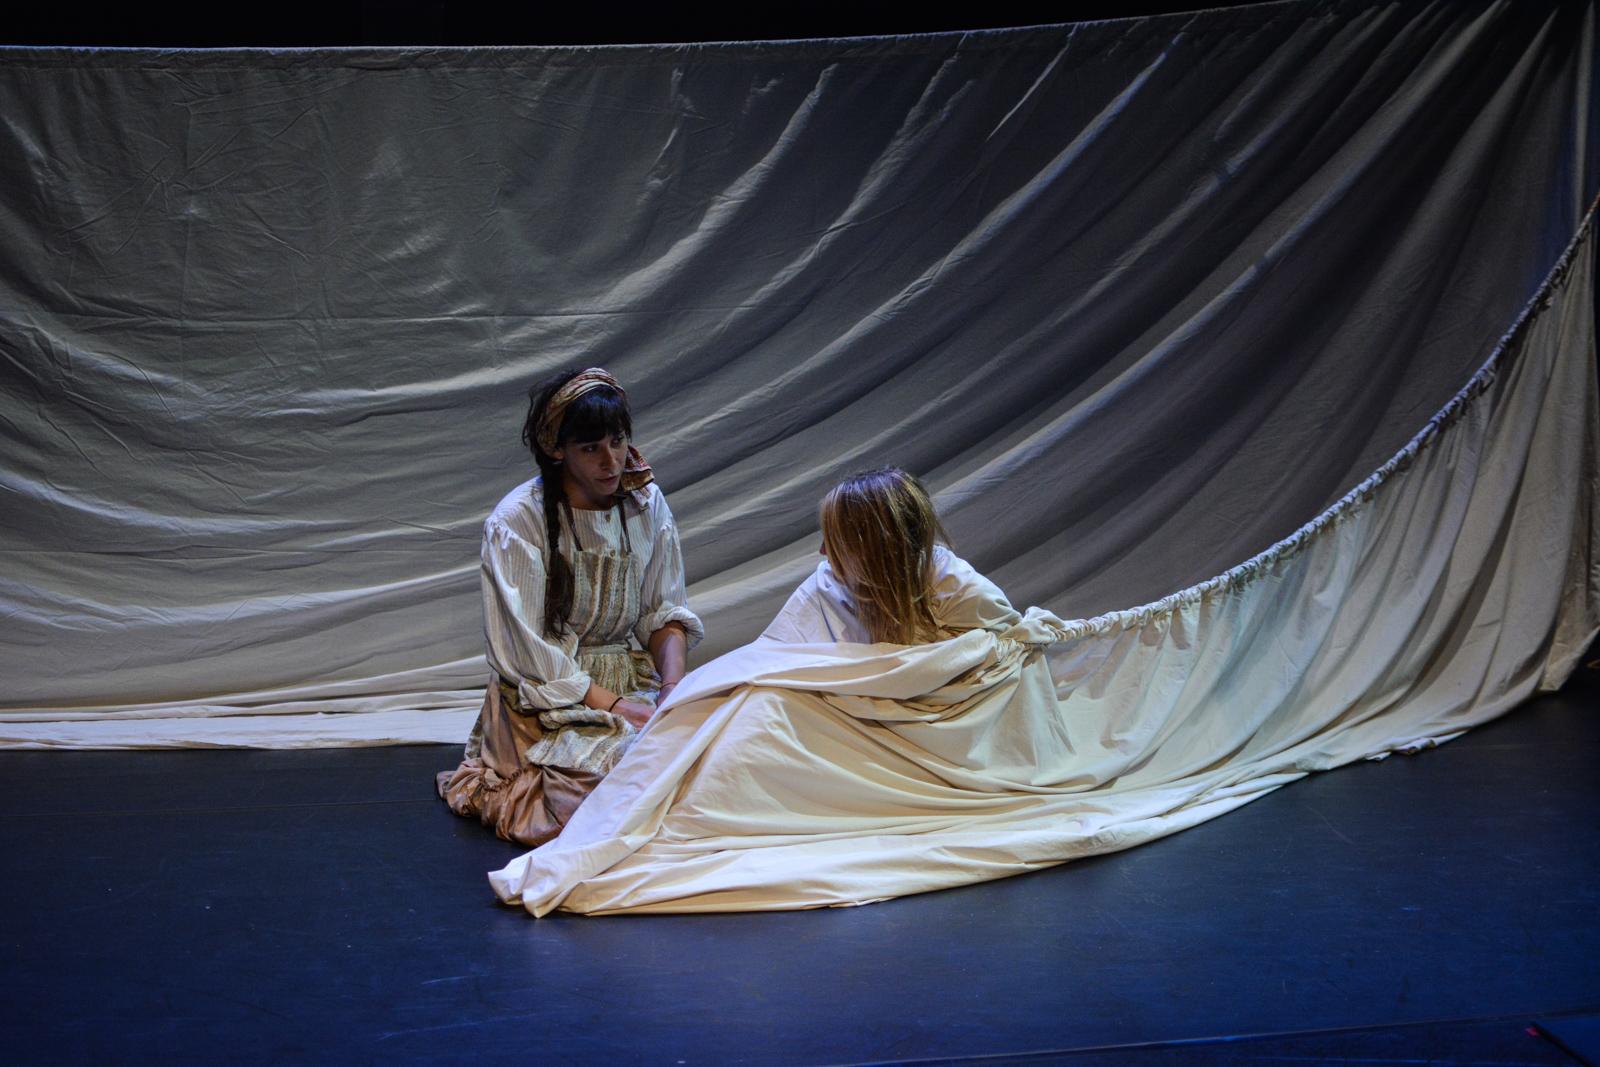 Kristina as Euphrasie with Alex Spieth as Senza in Marvellous . Photo by Kelley Van Dilla.